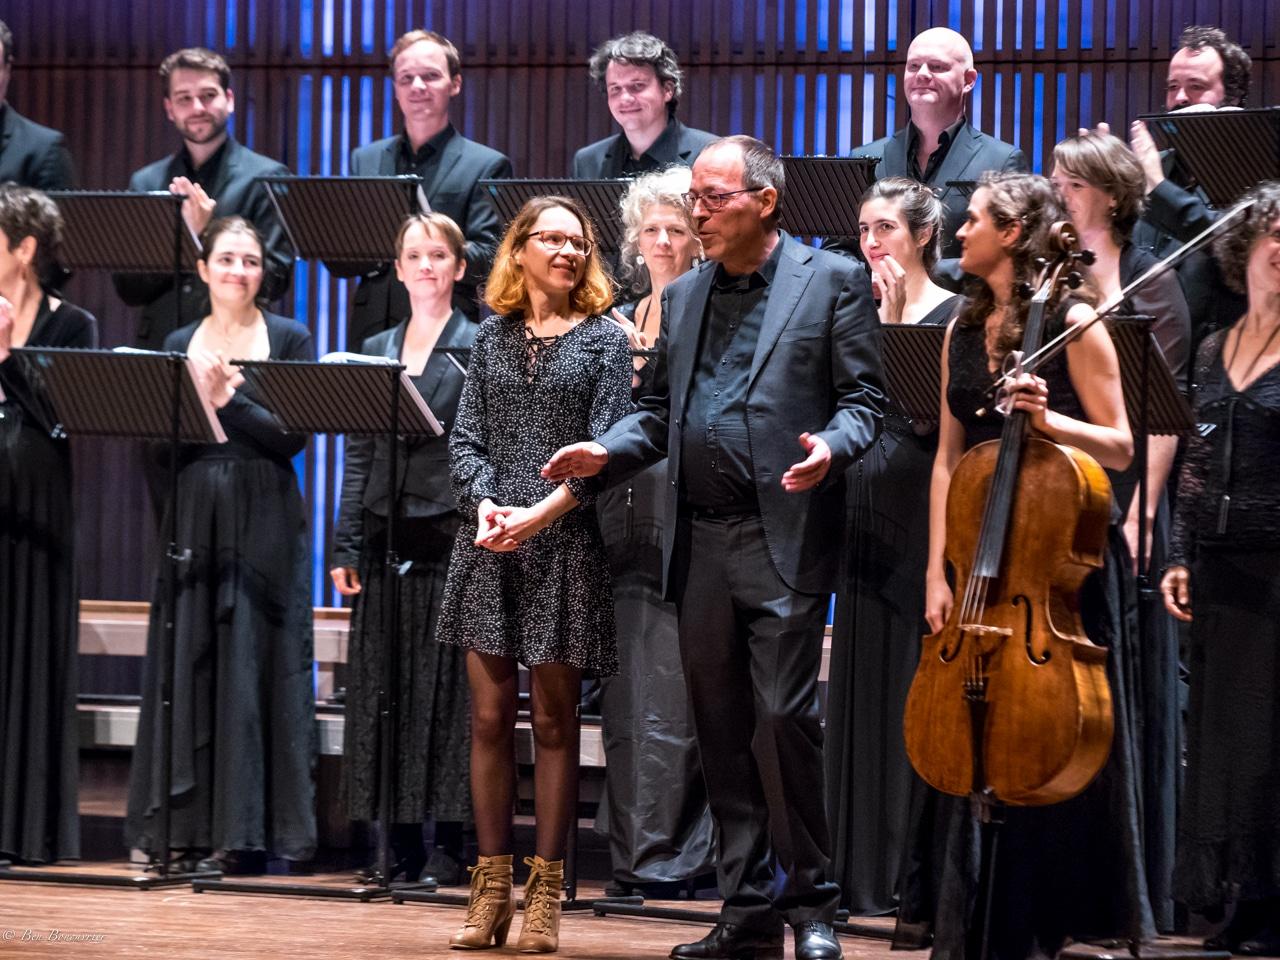 Cappella Amsterdam, Santa Ratniece, Daniel Reuss, Monika Leskovar MGIJ 25-10-2016